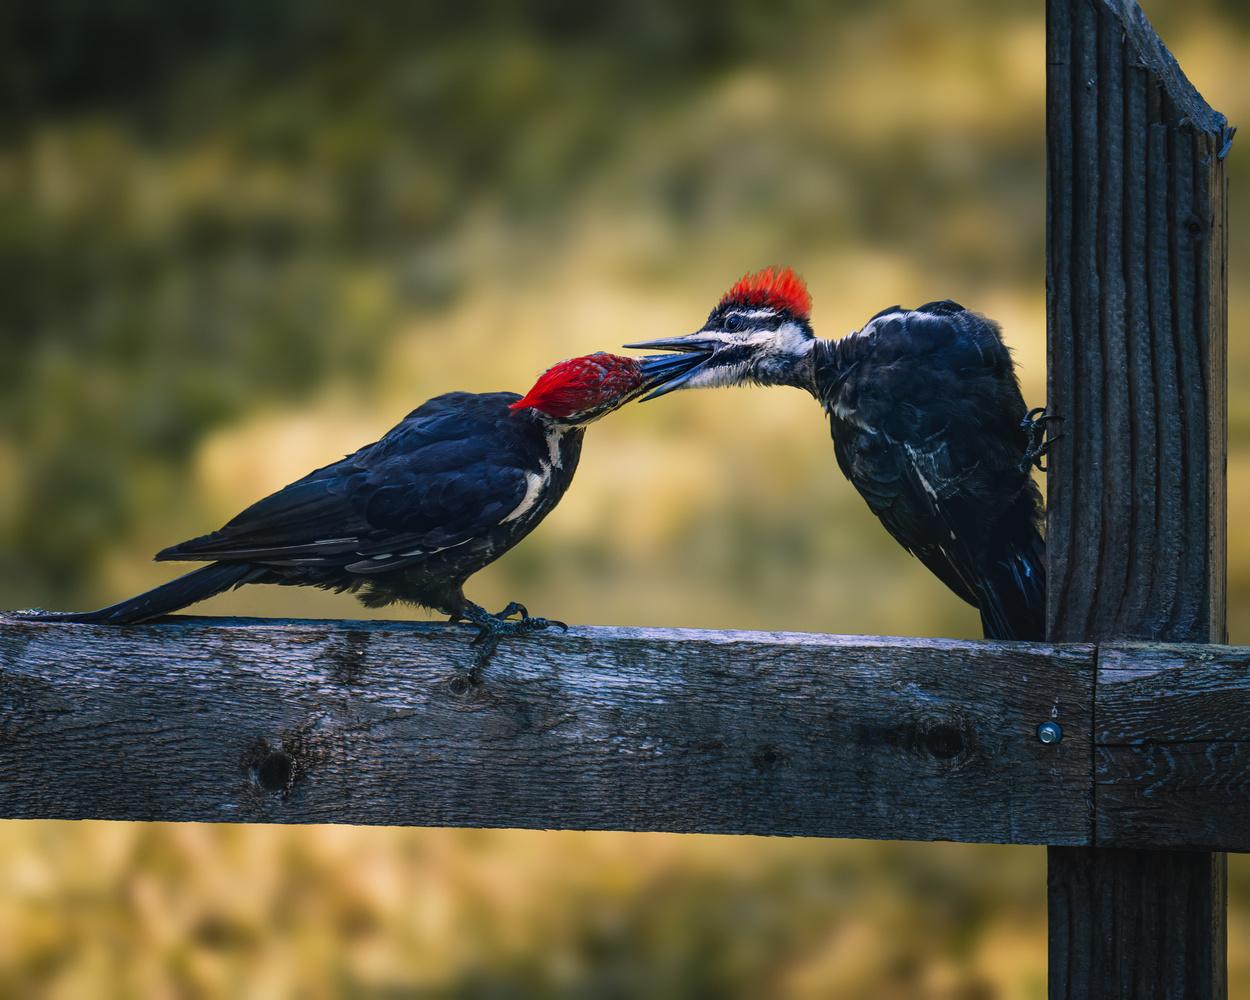 Pileated woodpecker by Skyler Ewing